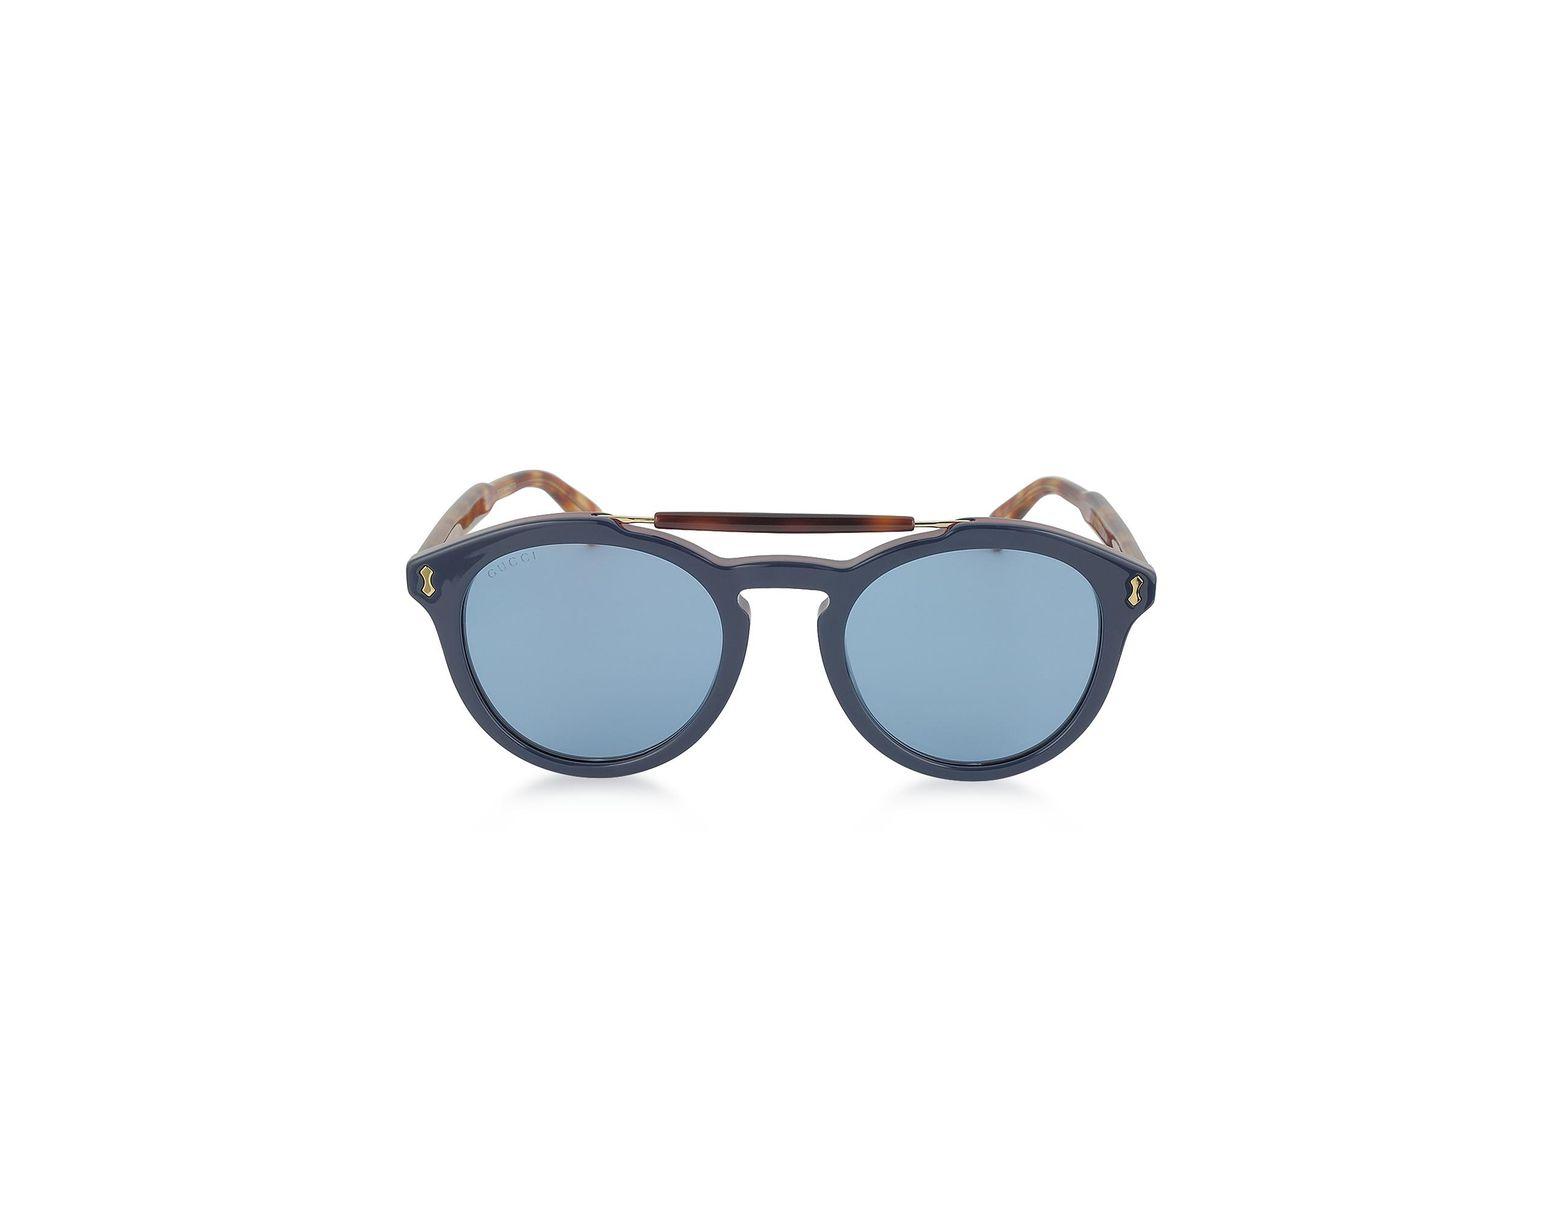 b6900566670 Lyst - Gucci GG0124S Acetate Round Aviator Men s Sunglasses in Blue for Men